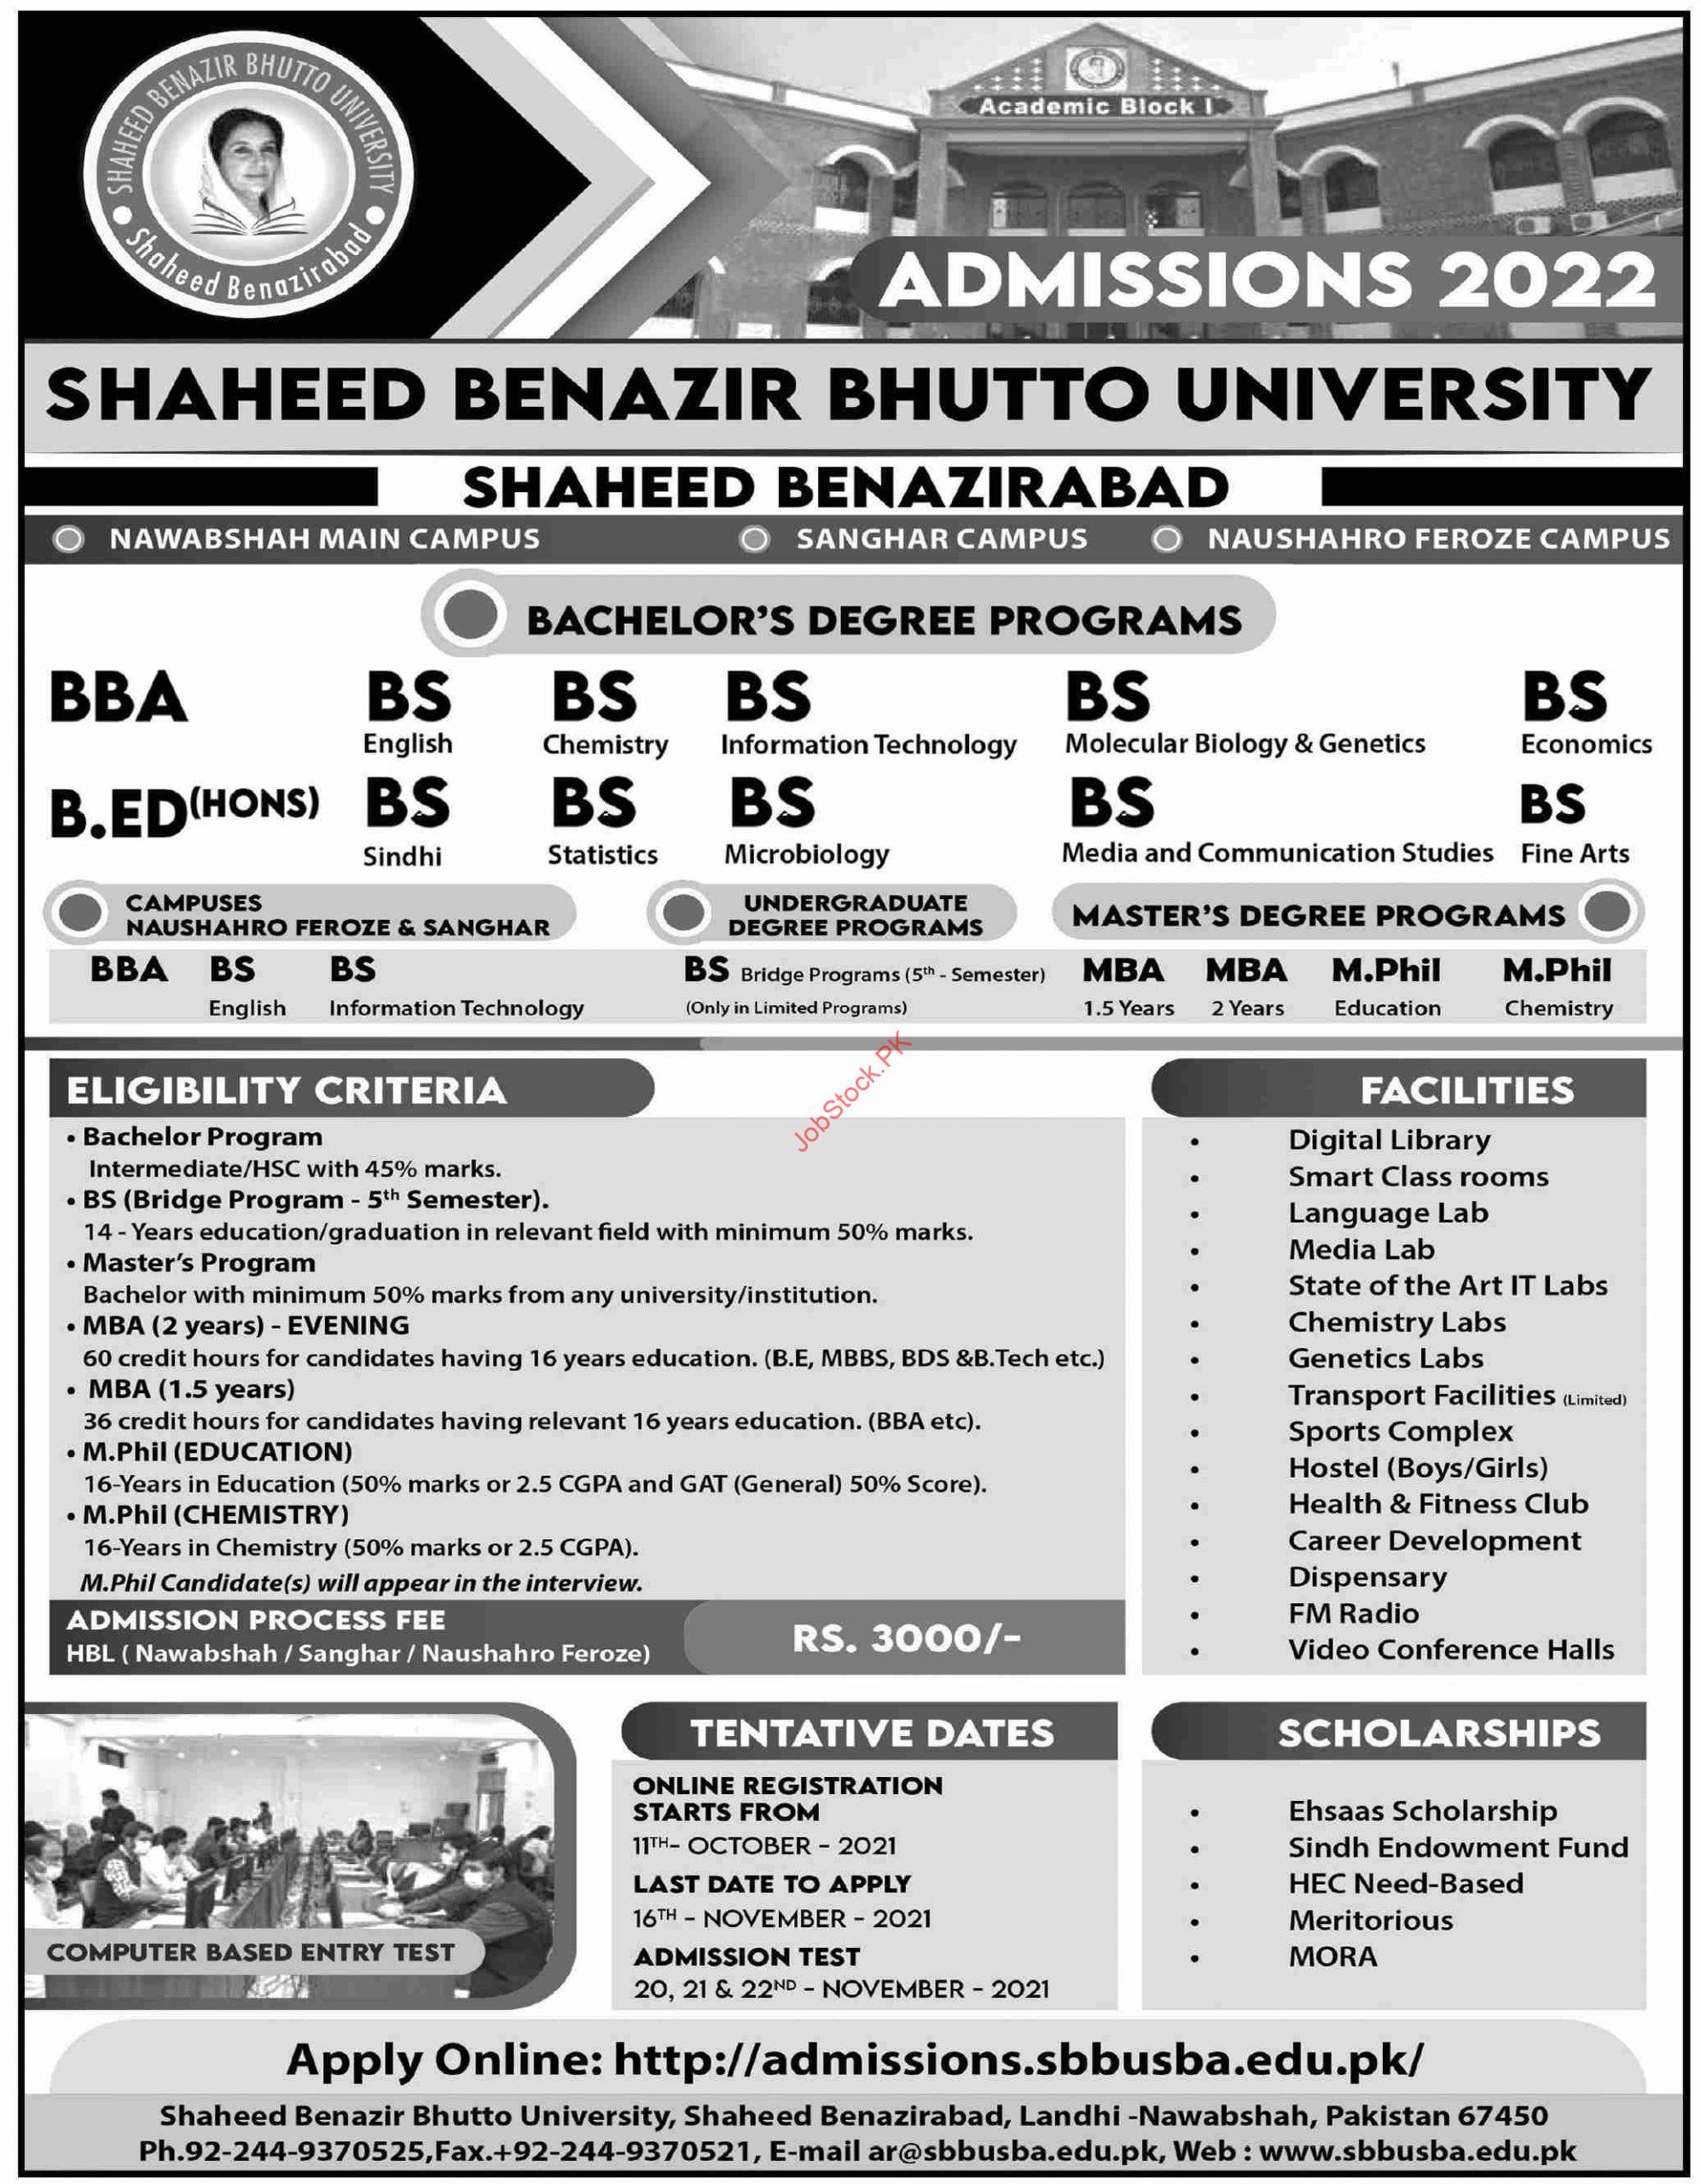 Shaheed Benazir Bhutto University Admission Fall 2022 Advertisement